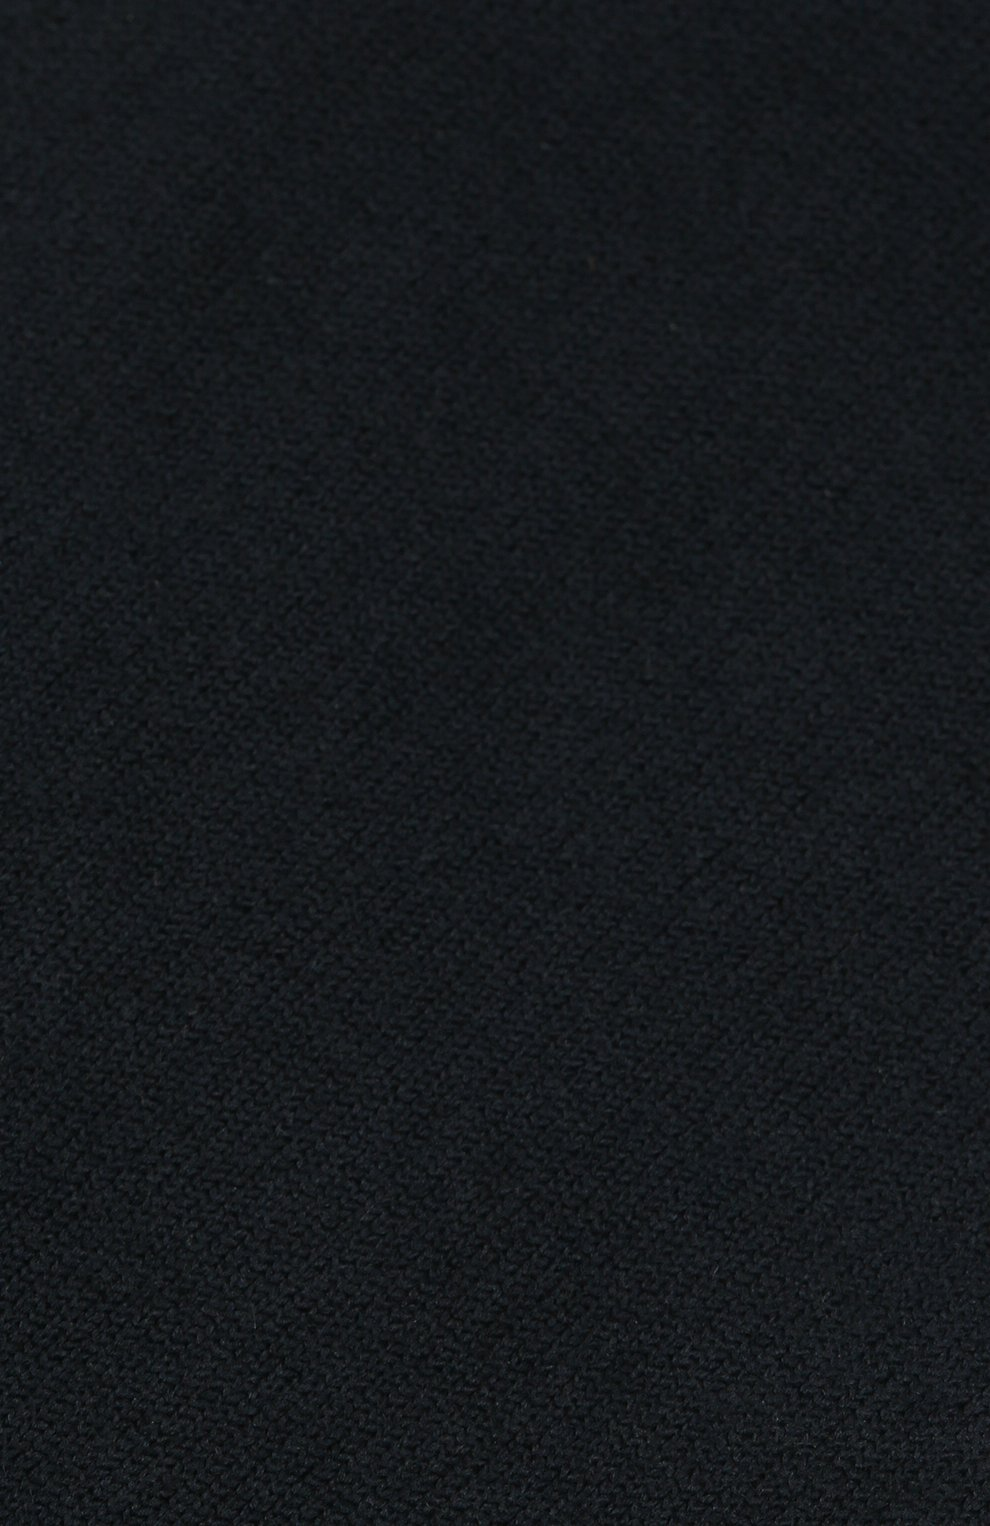 Детские колготки FALKE темно-синего цвета, арт. 13870. | Фото 2 (Материал: Текстиль, Хлопок)